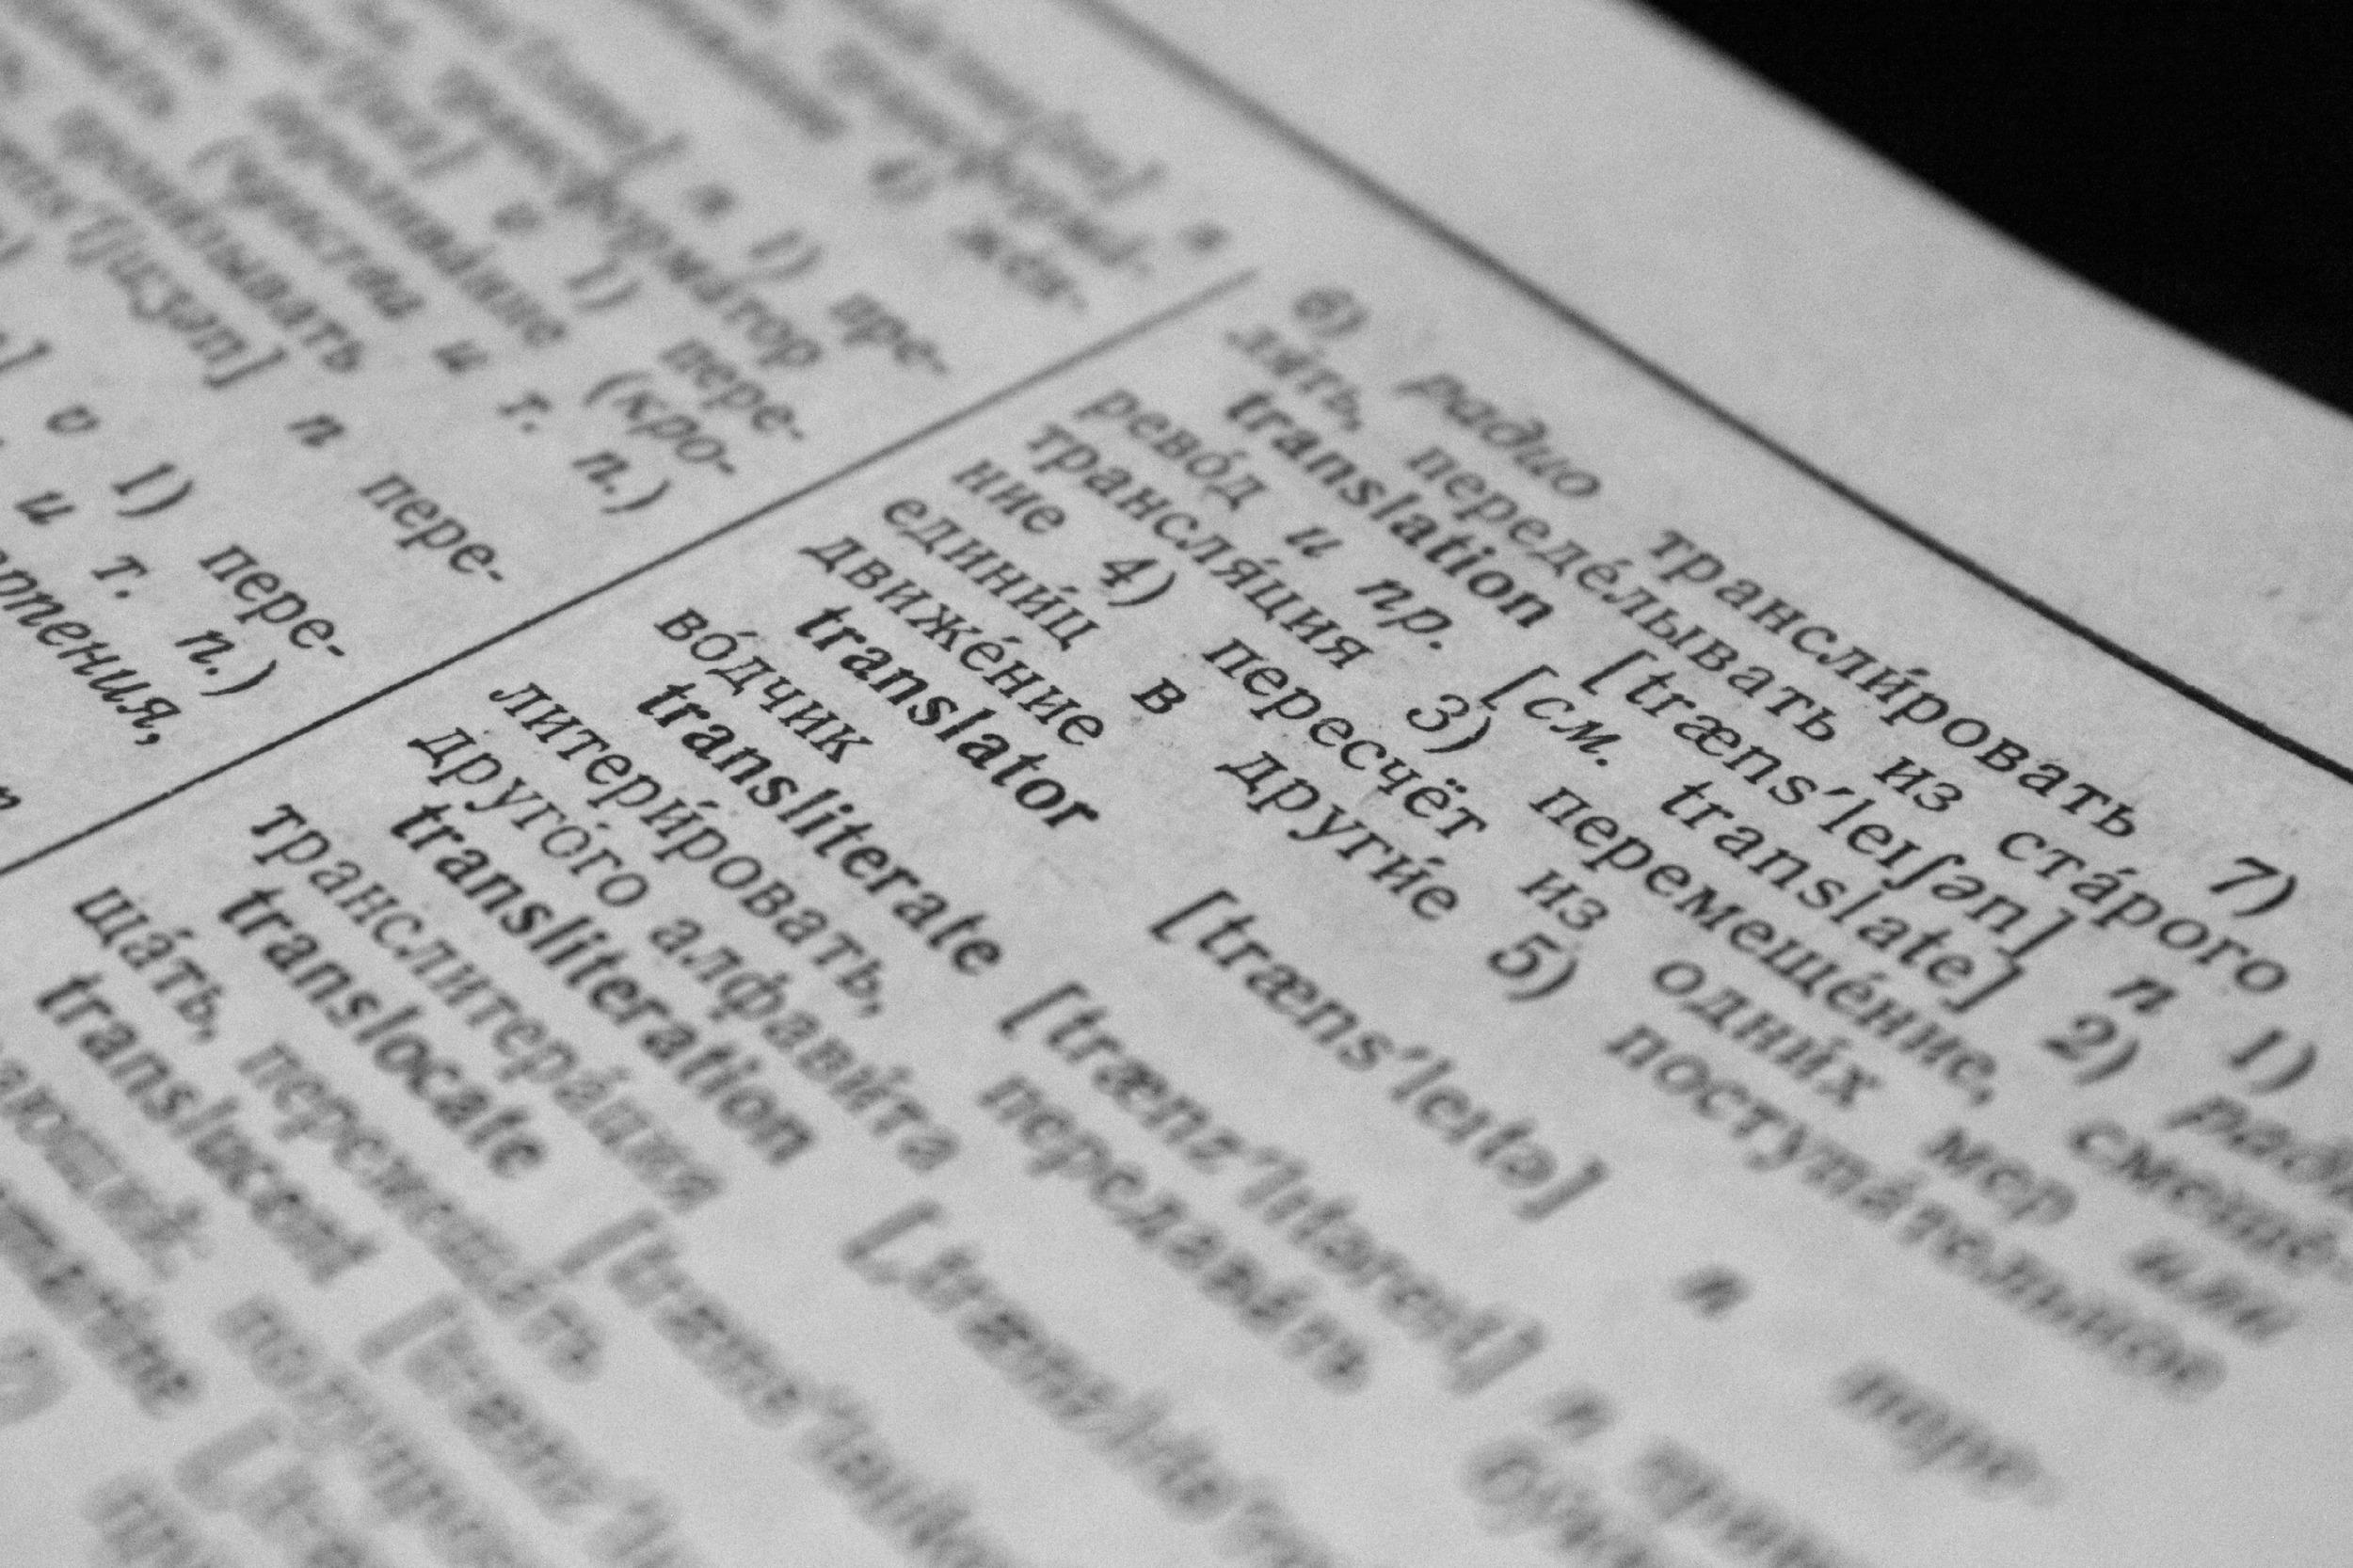 dictionary translate ru eng